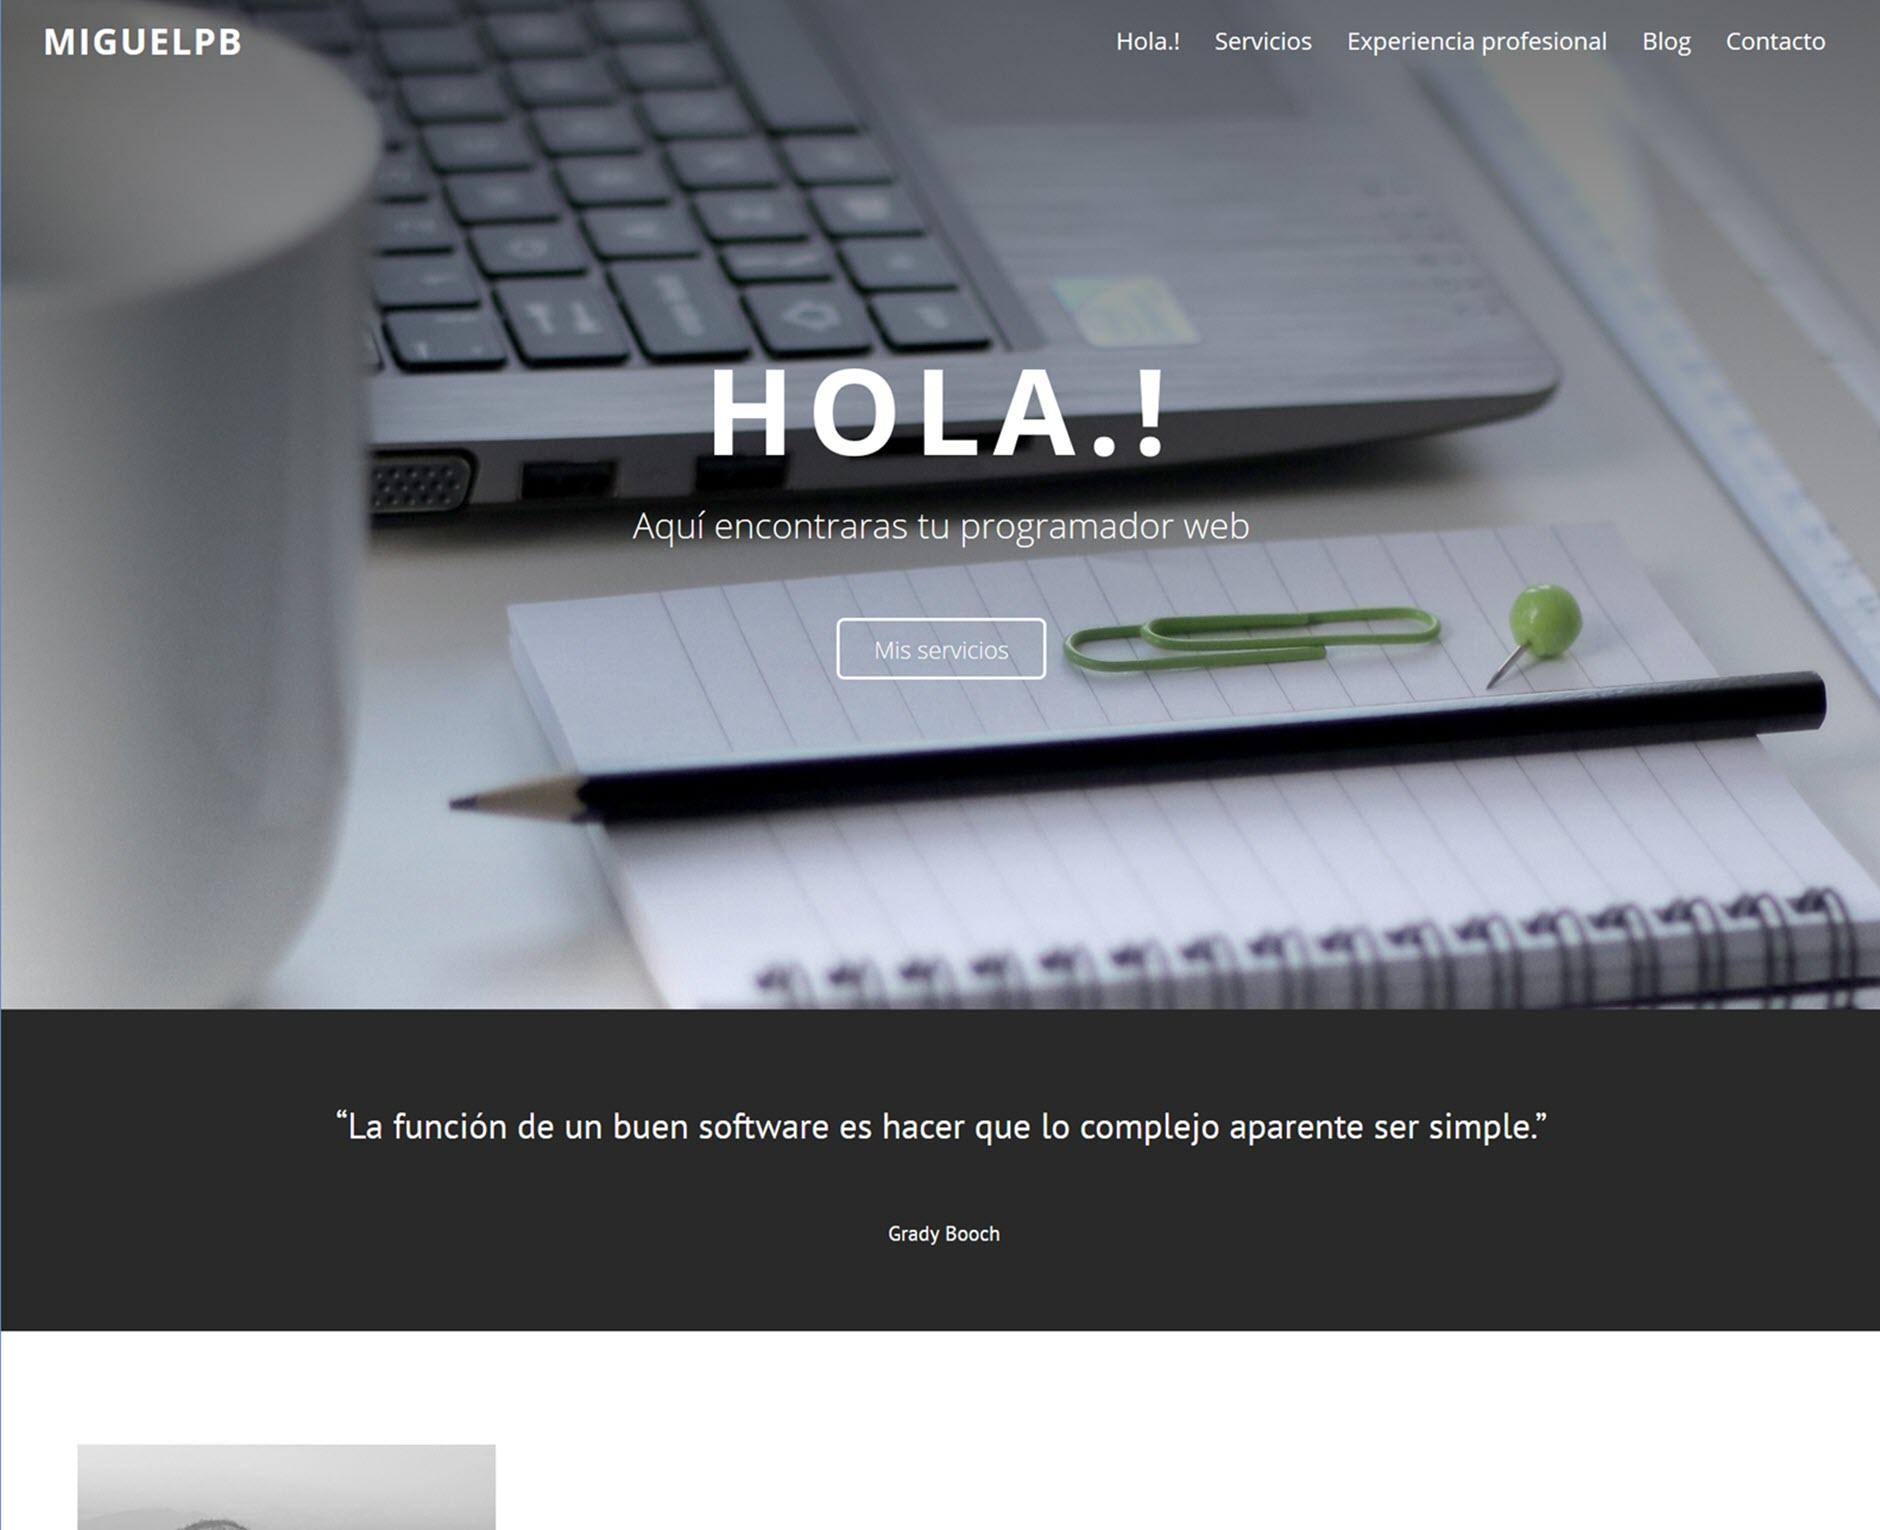 miguelpb.com